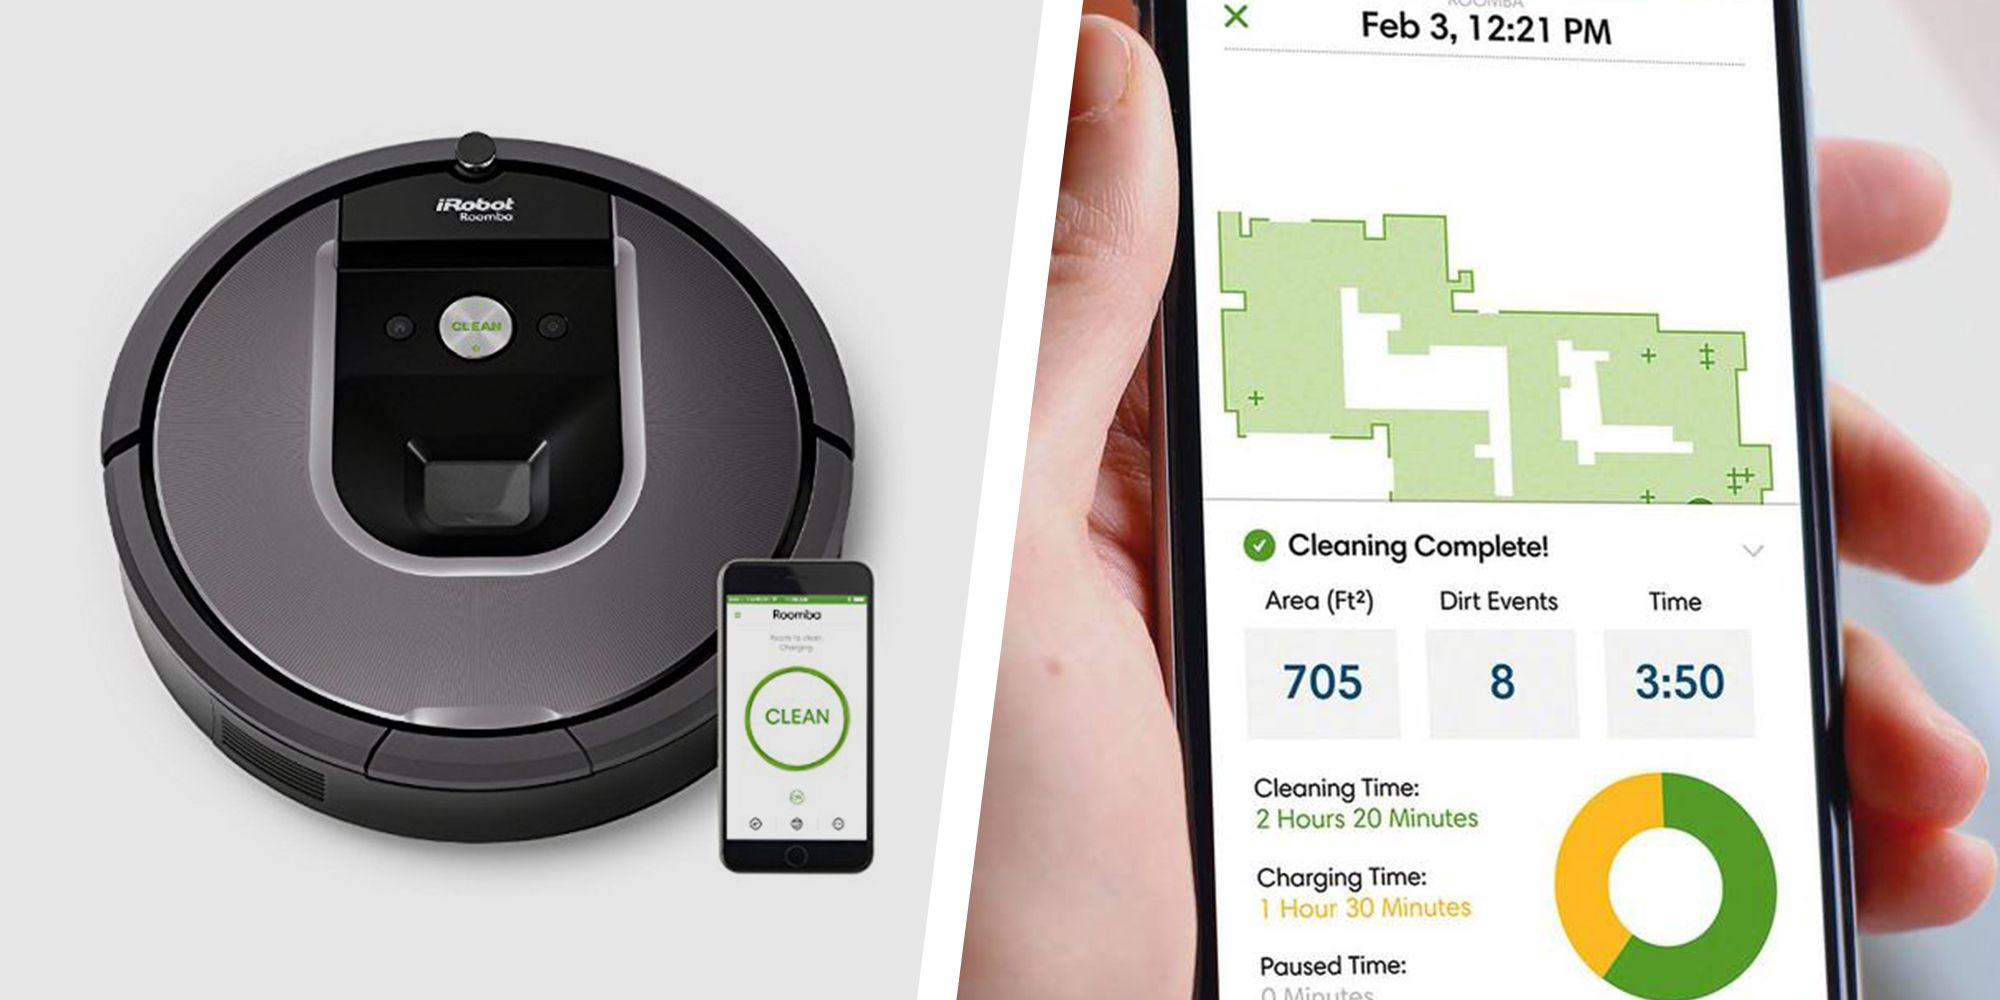 Save $200 on This iRobot Roomba Vacuum on Amazon Today